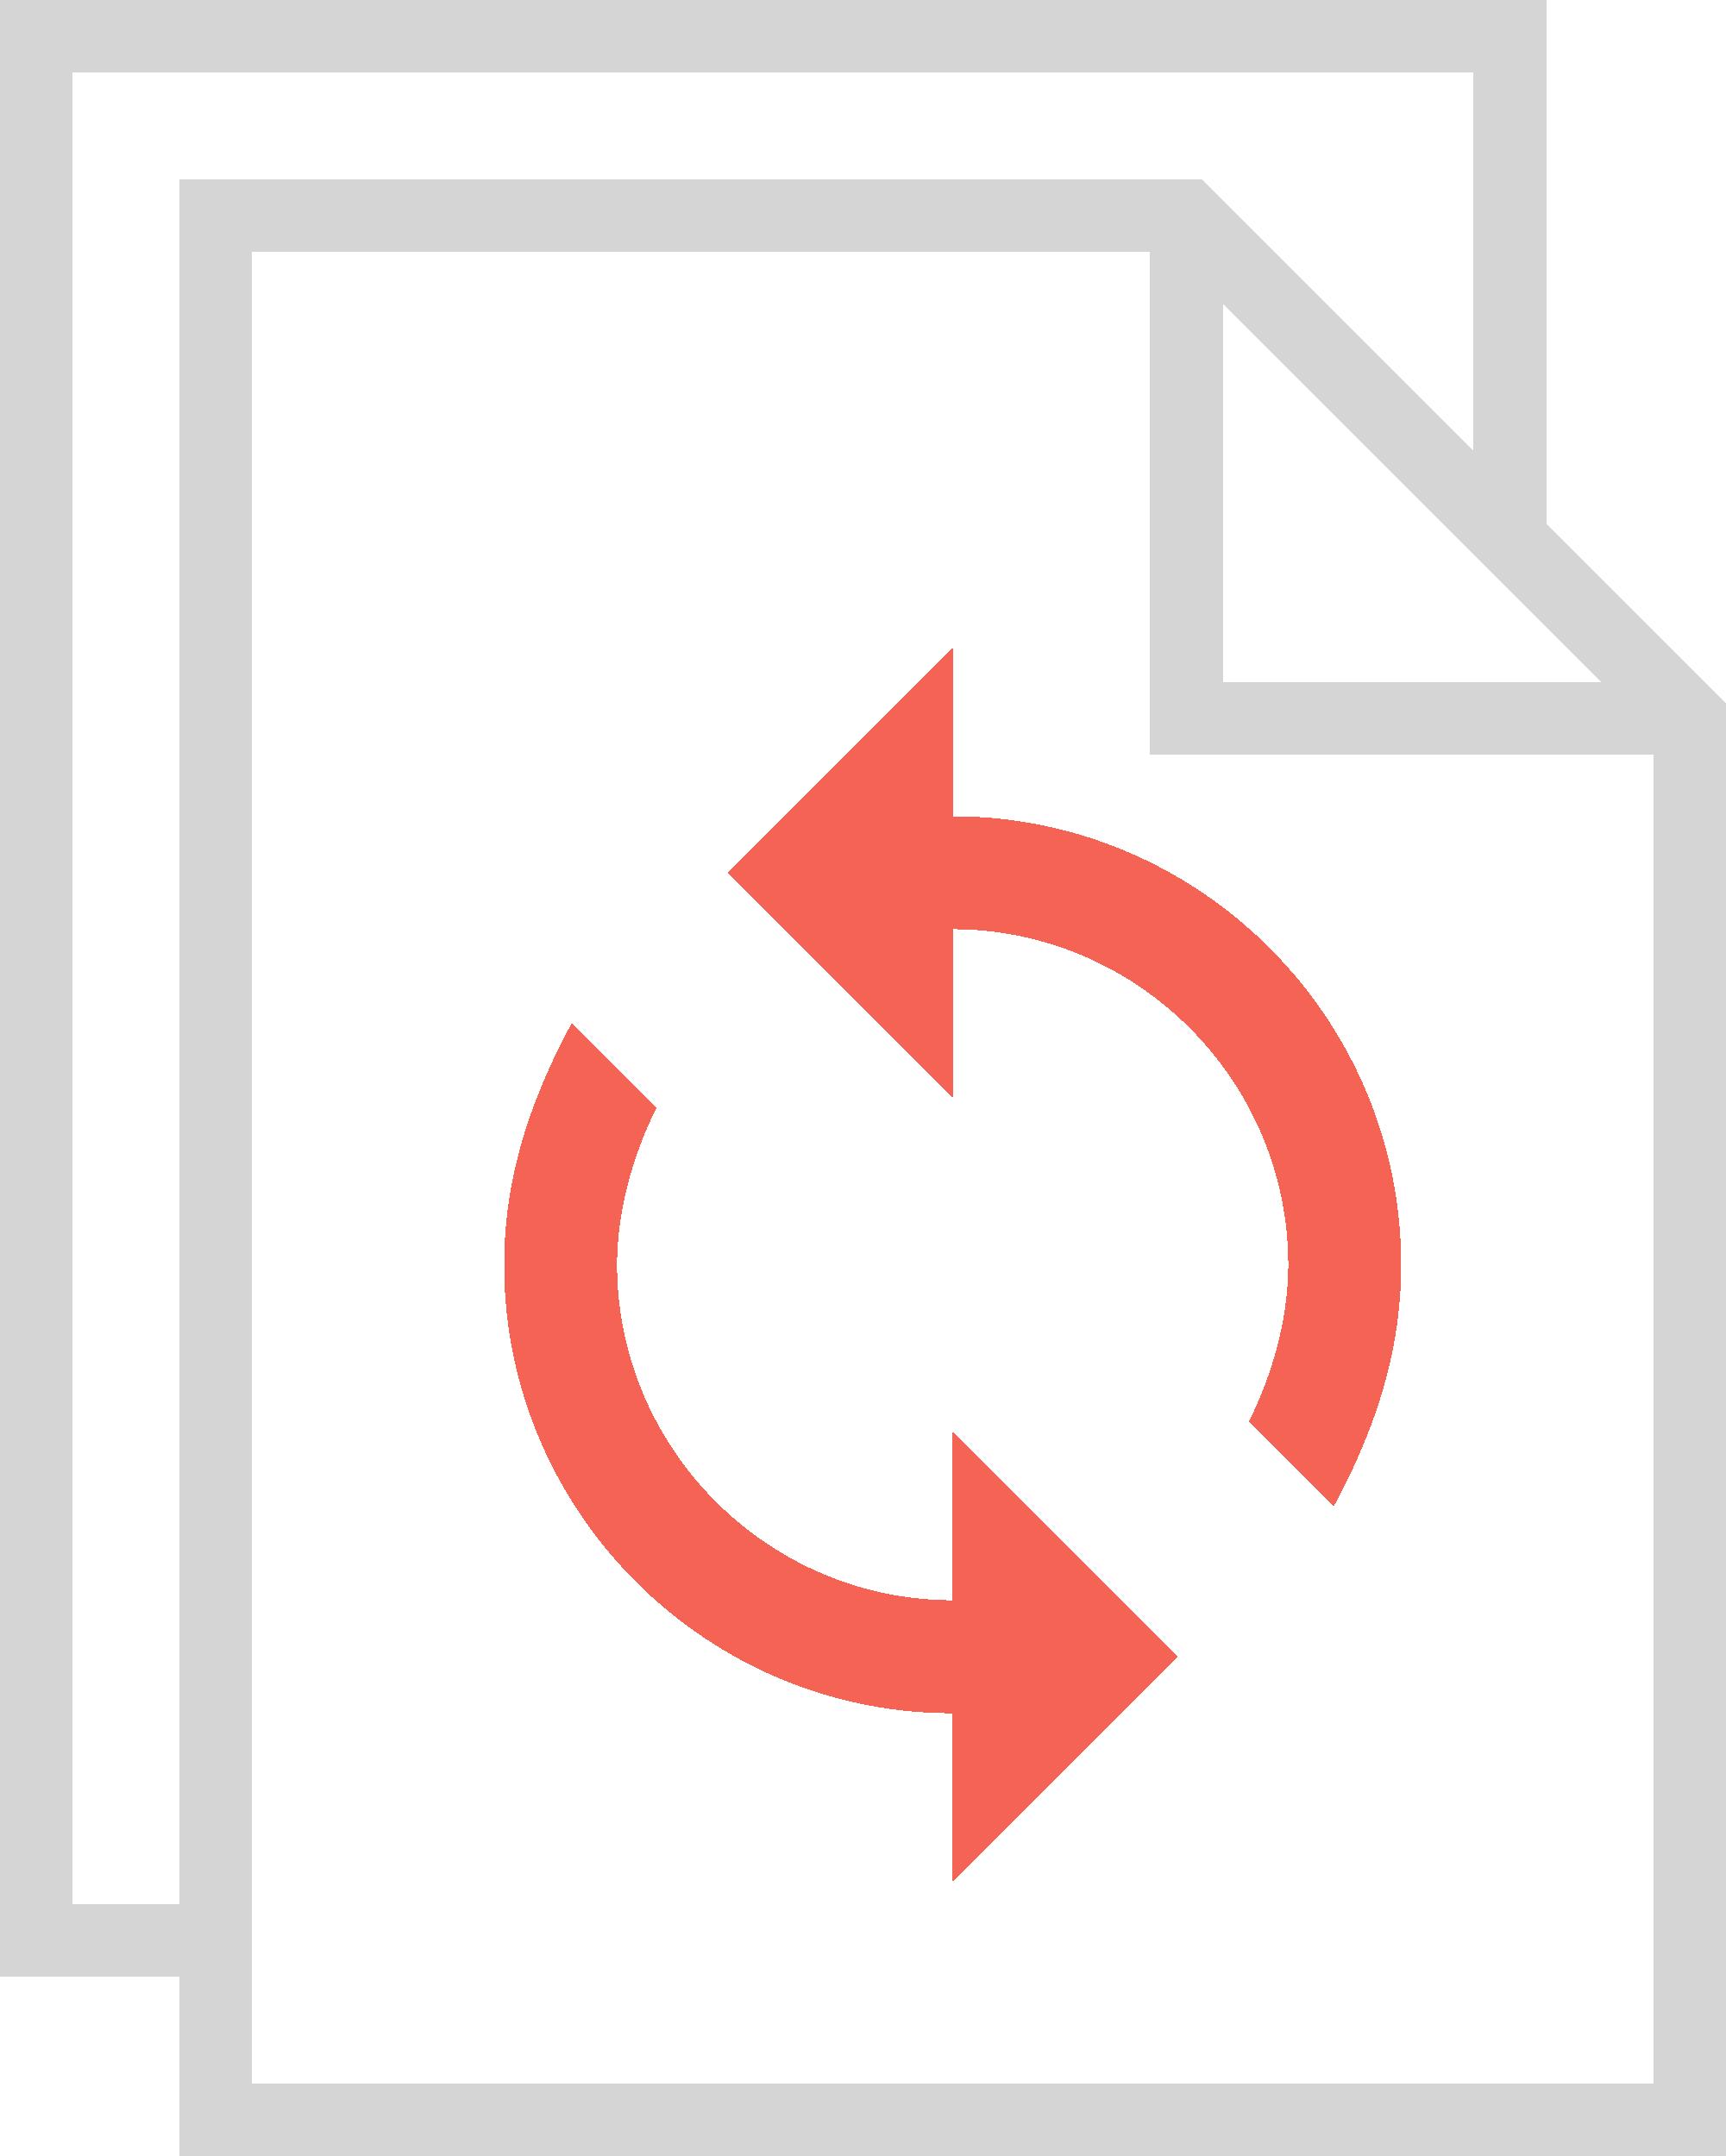 icon-36-improvedtemplateupdateprocess